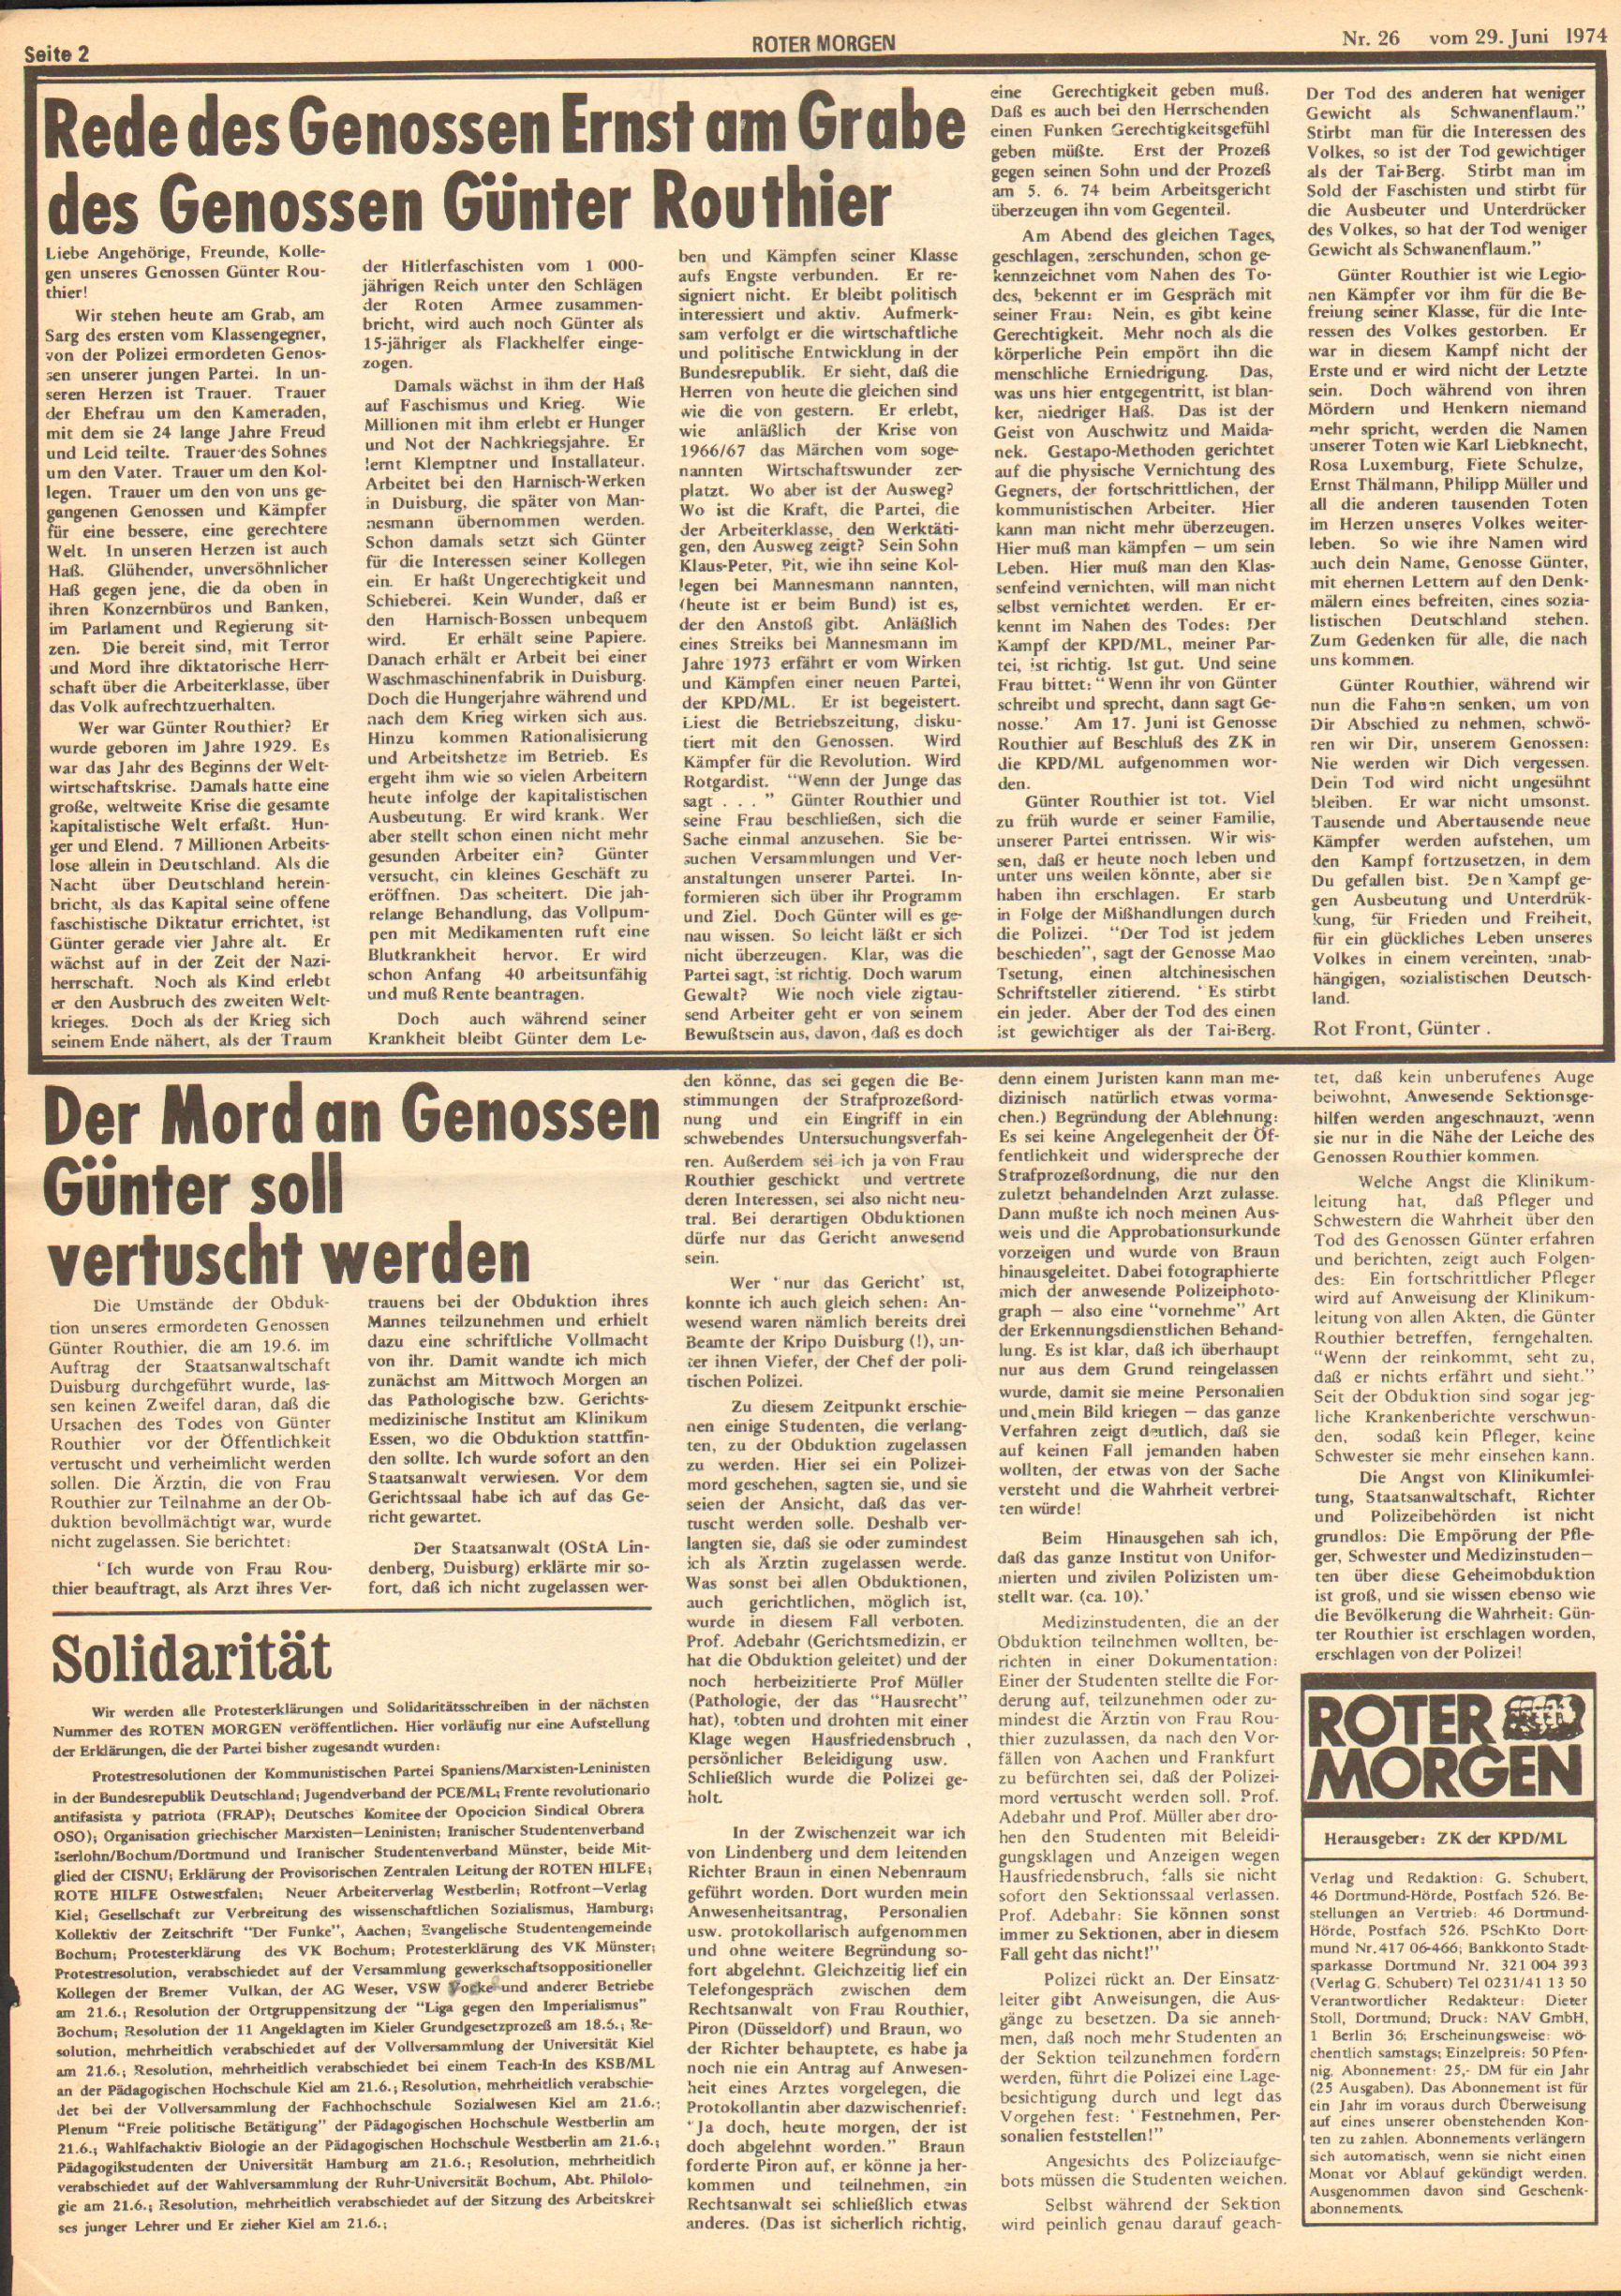 Roter Morgen, 8. Jg., 29. Juni 1974, Nr. 26, Seite 2